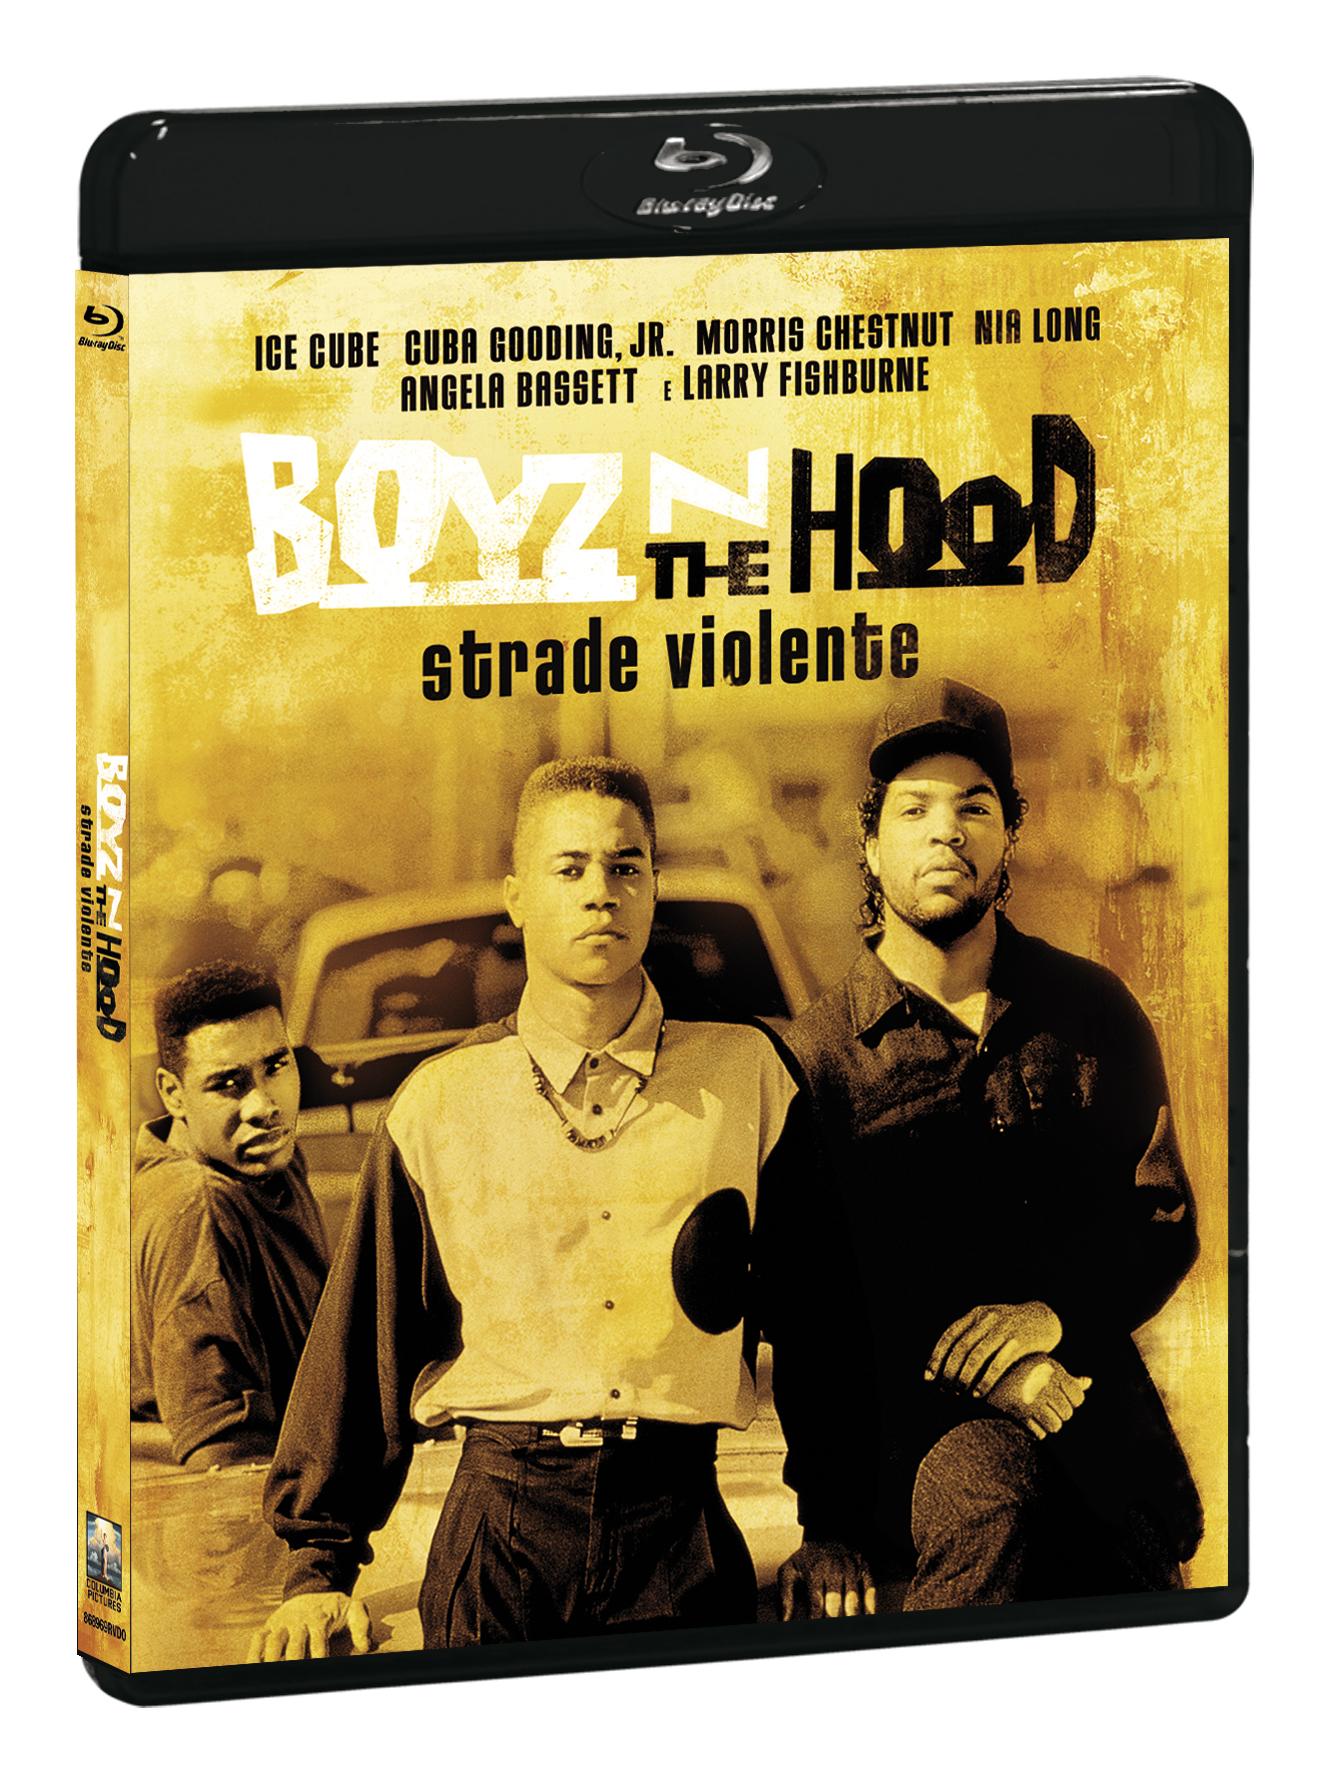 BOYZ N THE HOOD - STRADE VIOLENTE - BLU RAY